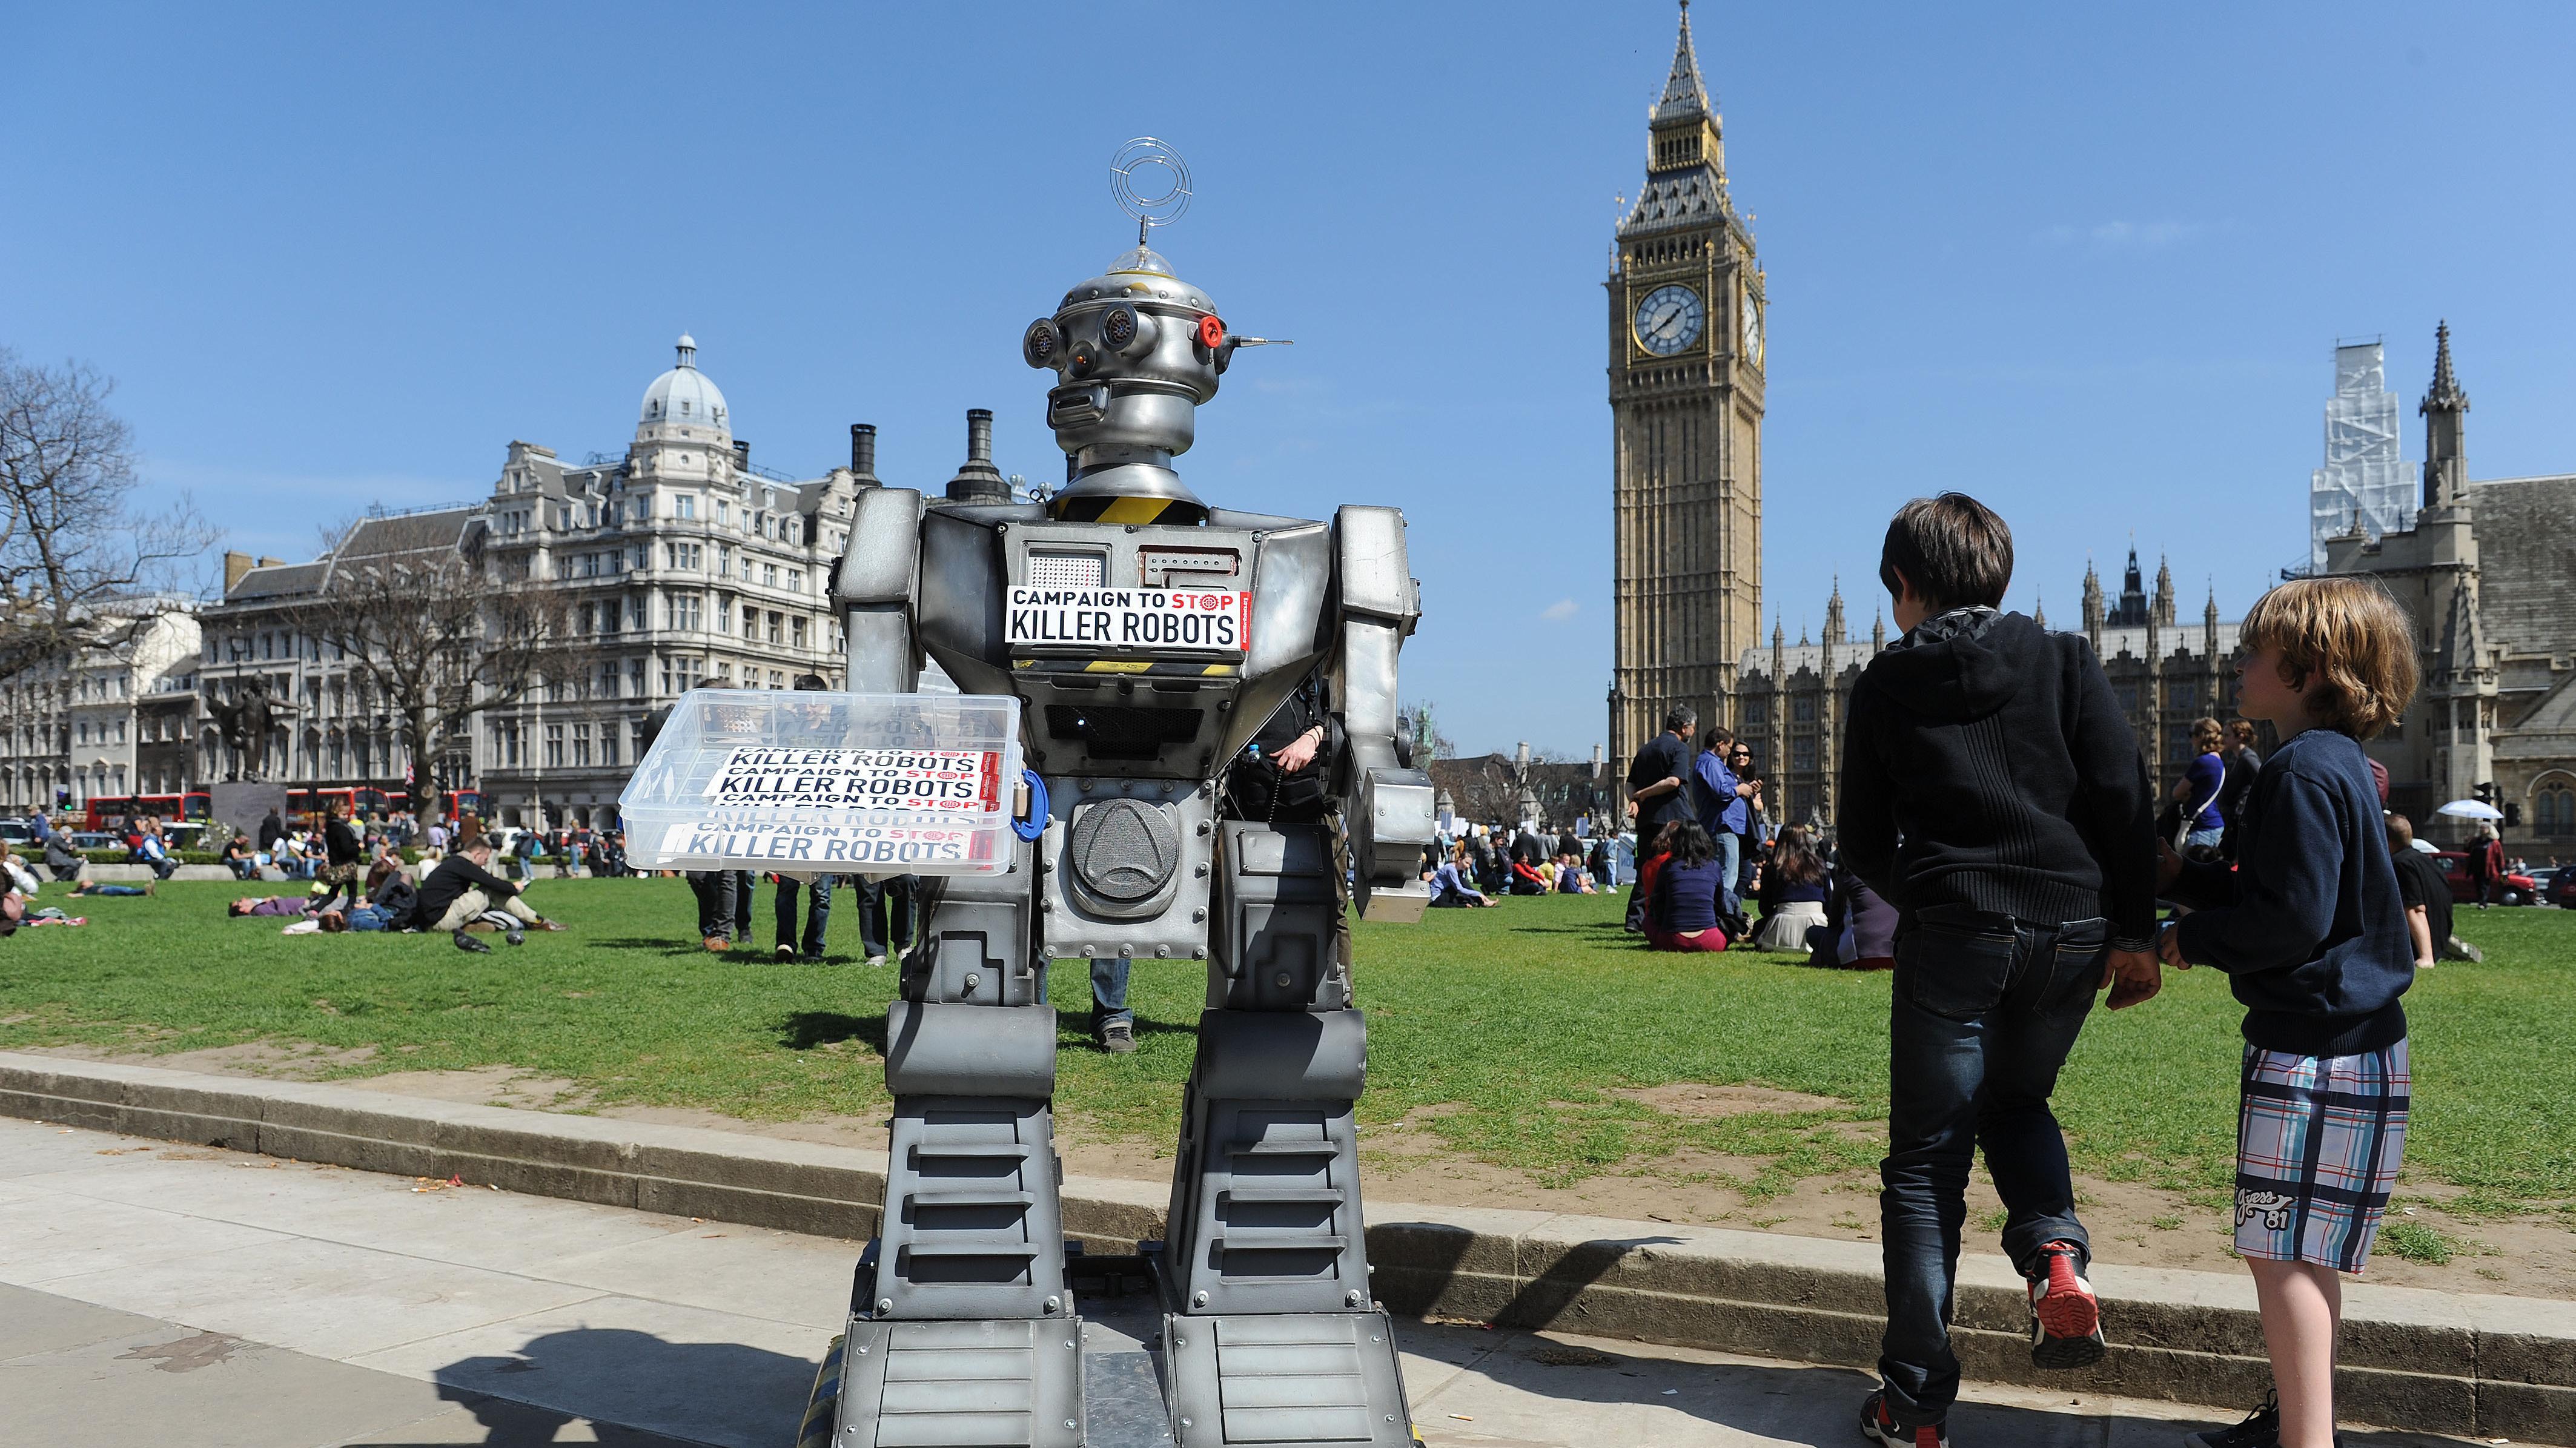 Roboter-Attrappe auf Anti-Killer-Roboter-Demo